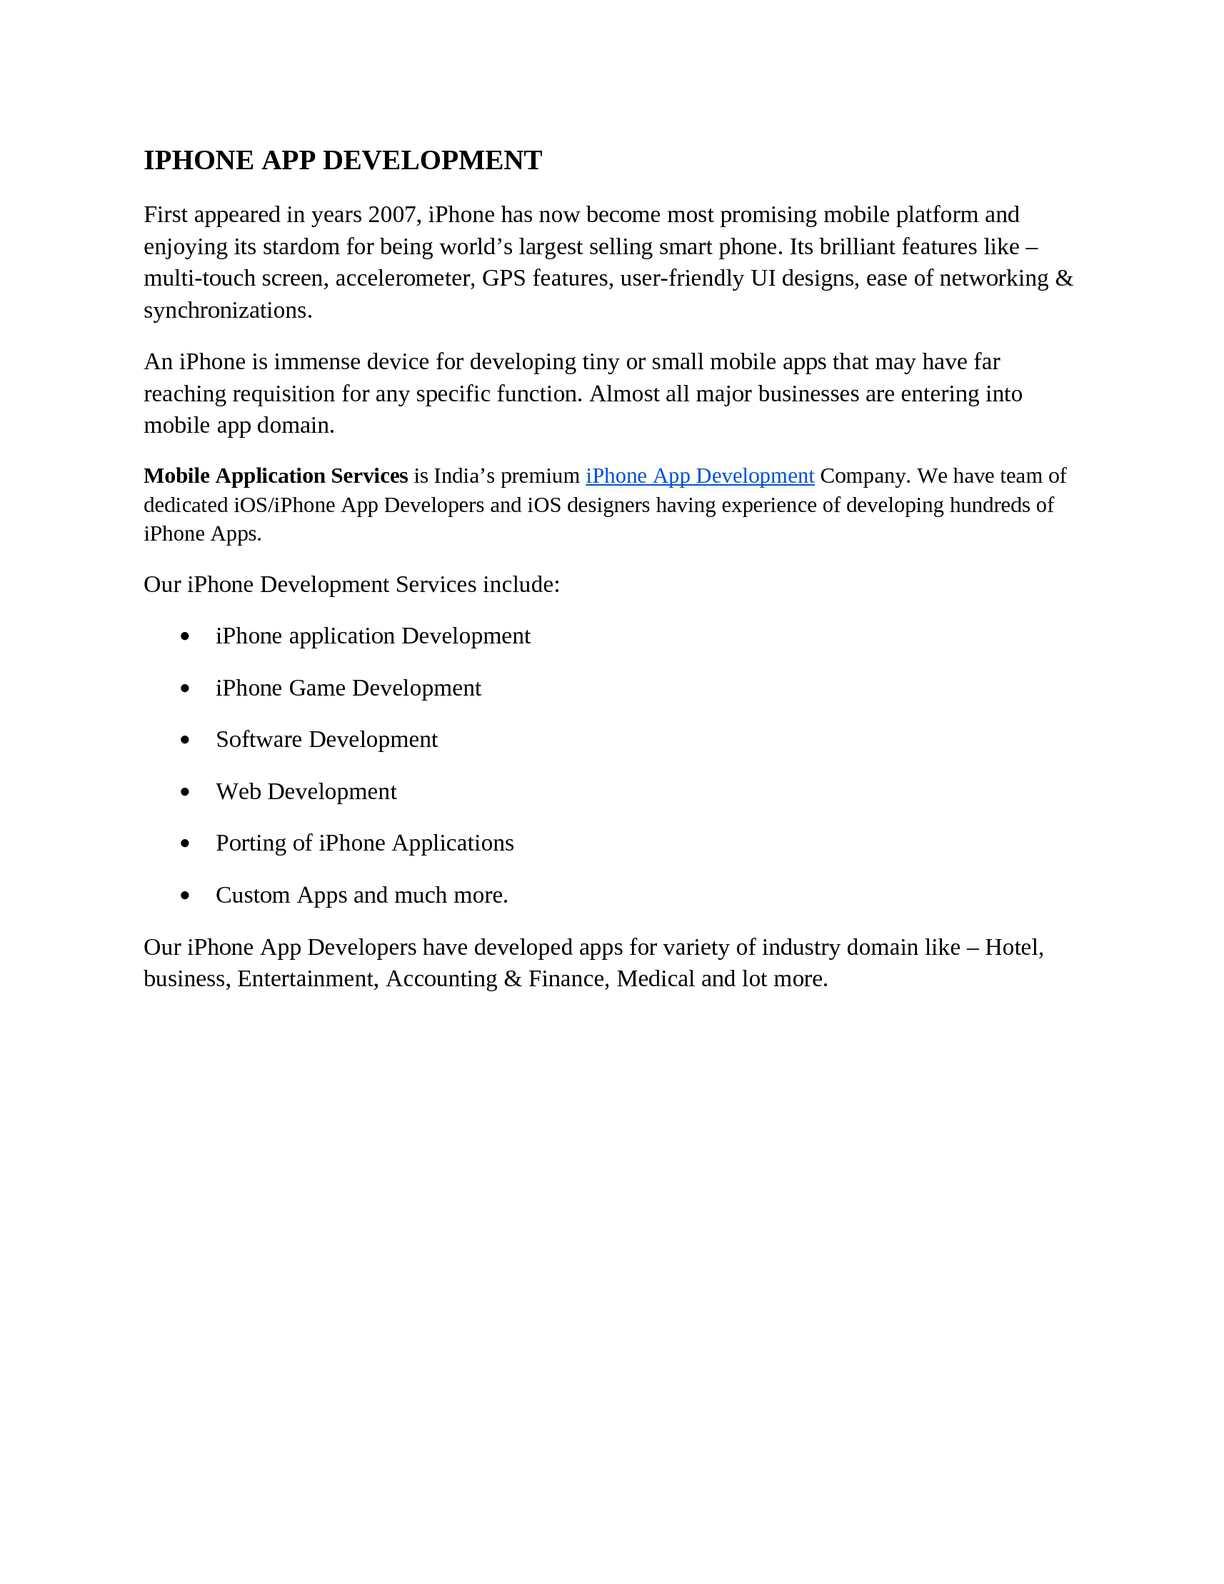 Calaméo - iPhone App Development